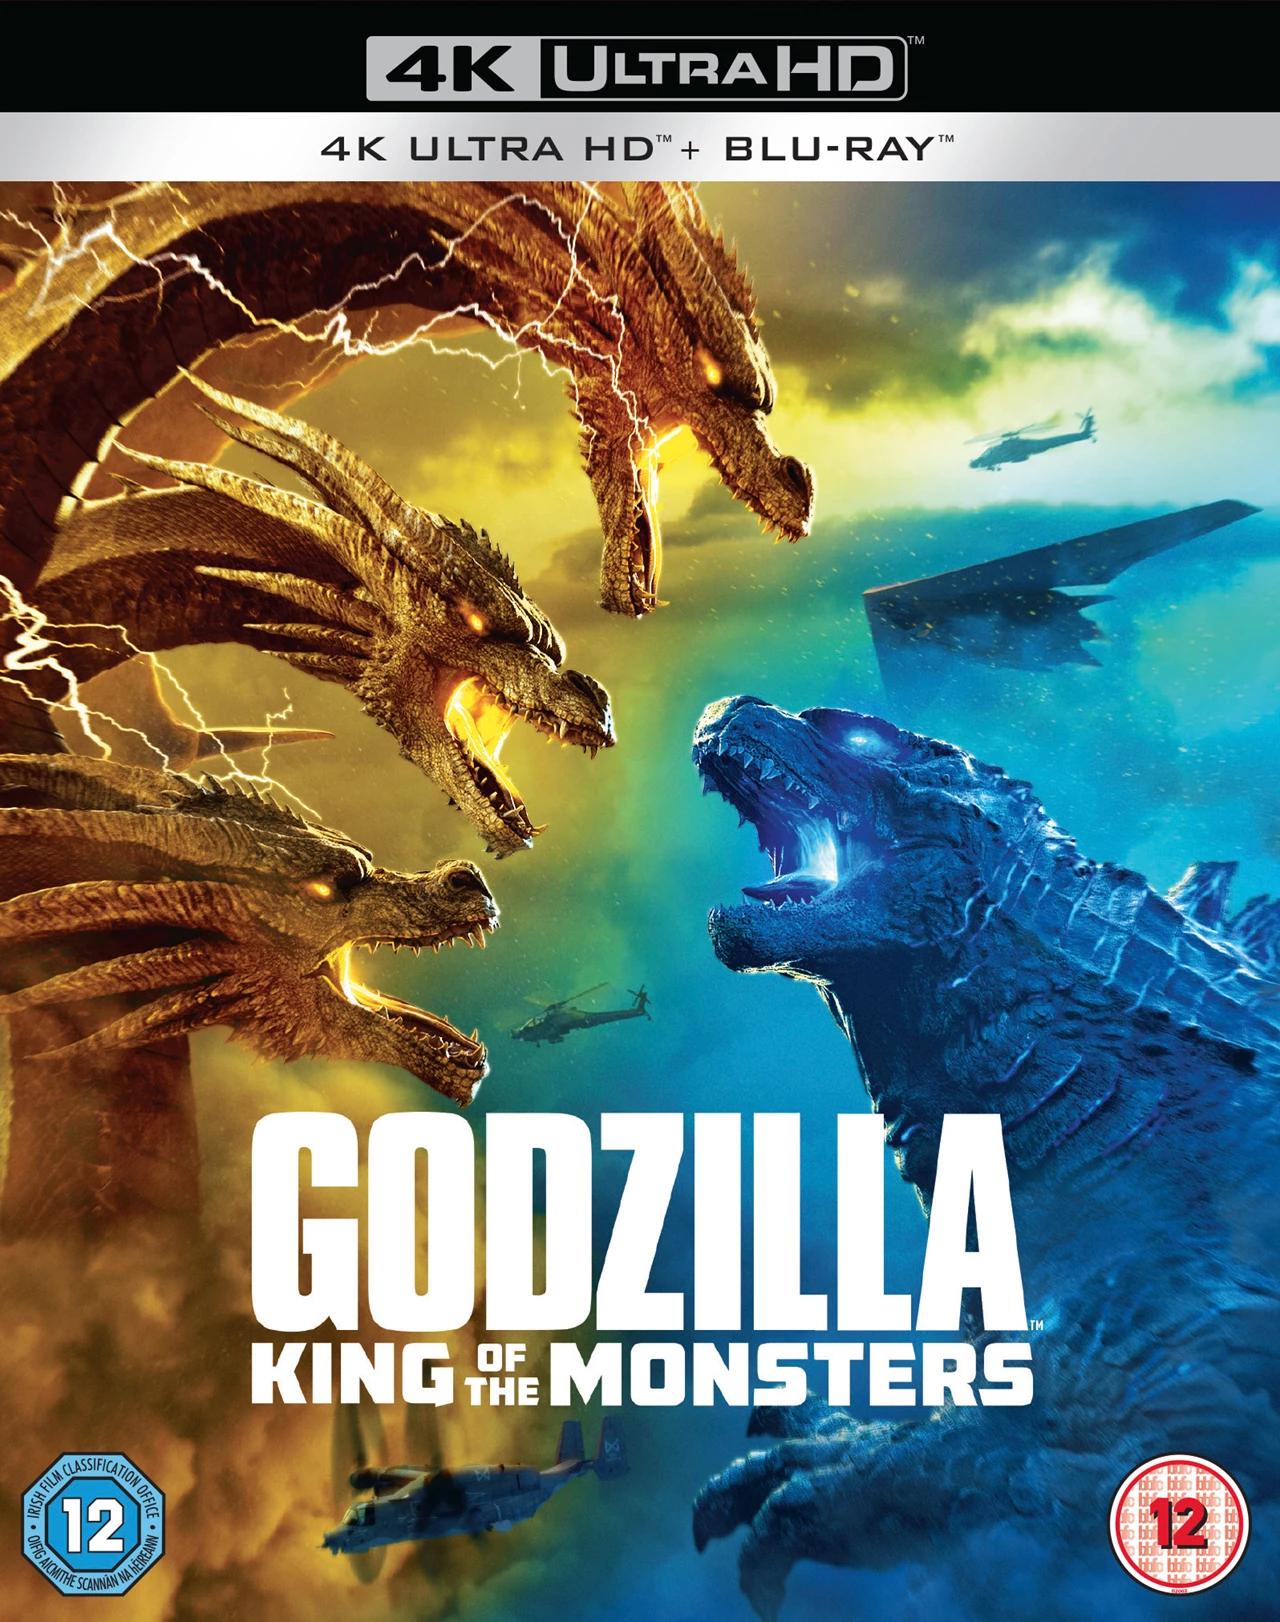 Godzilla king of monsters 4k - £13.99 (Prime) / £16.98 (non Prime) at Amazon; HMV has stock